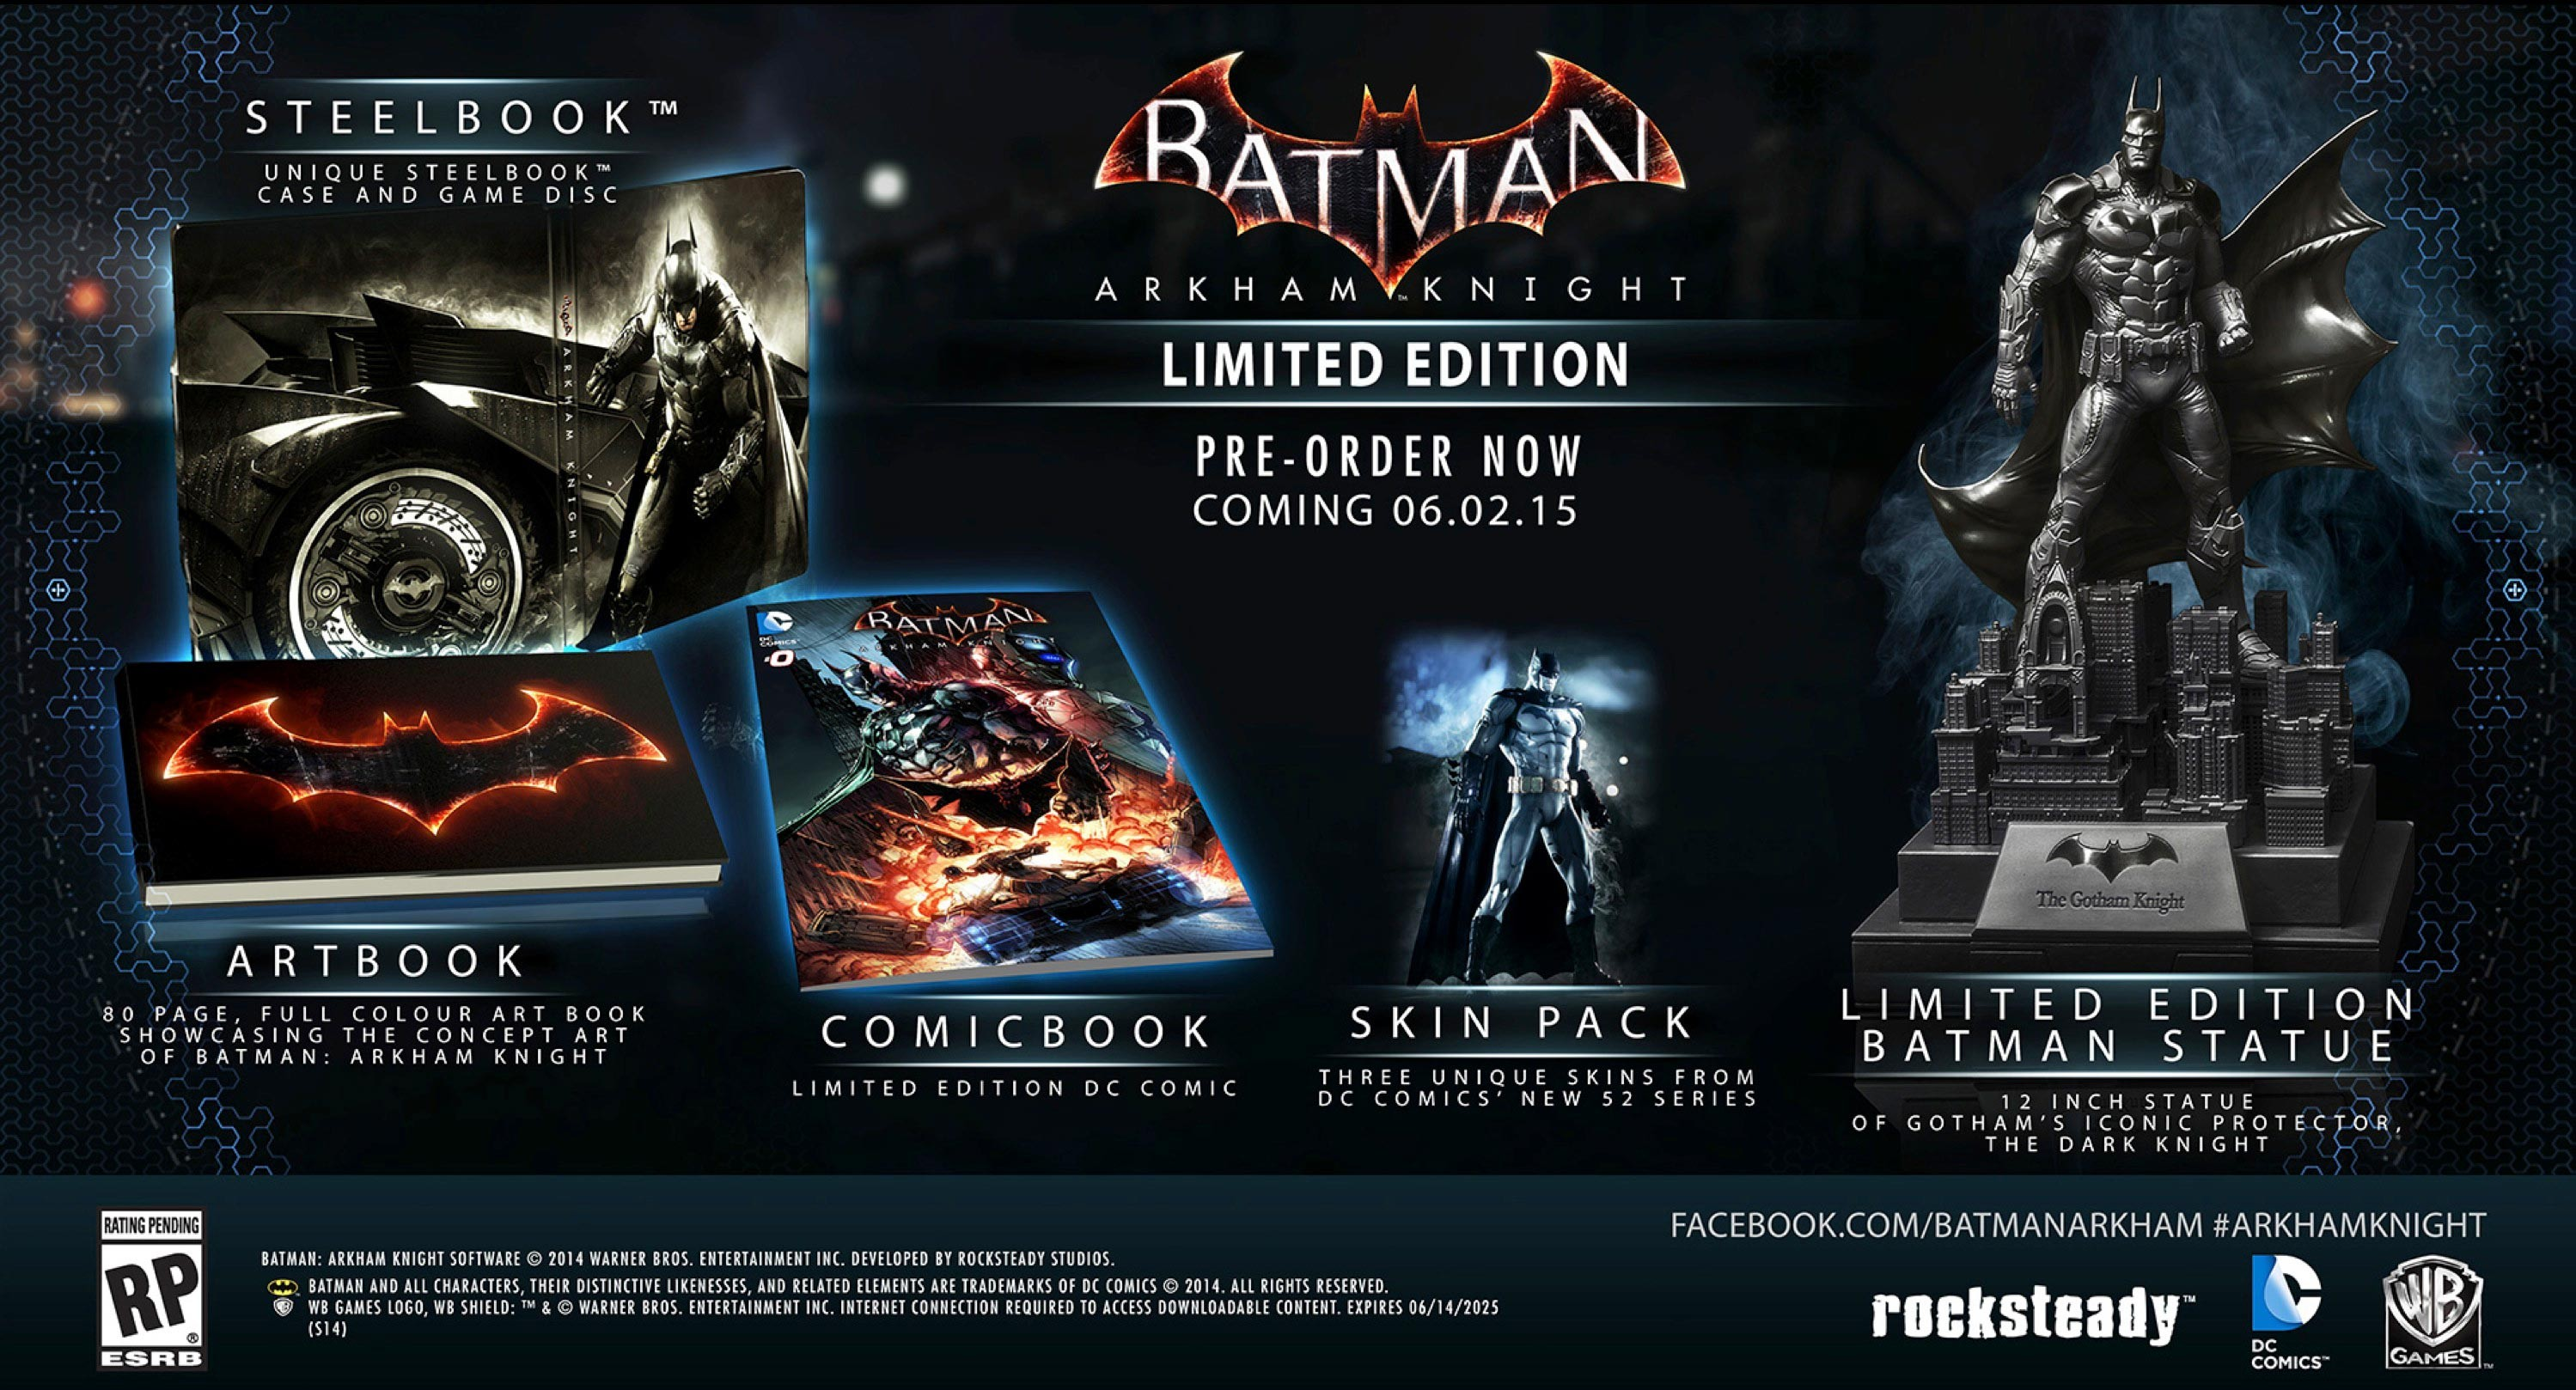 Batman arkham knight limited edition collection voltagebd Choice Image